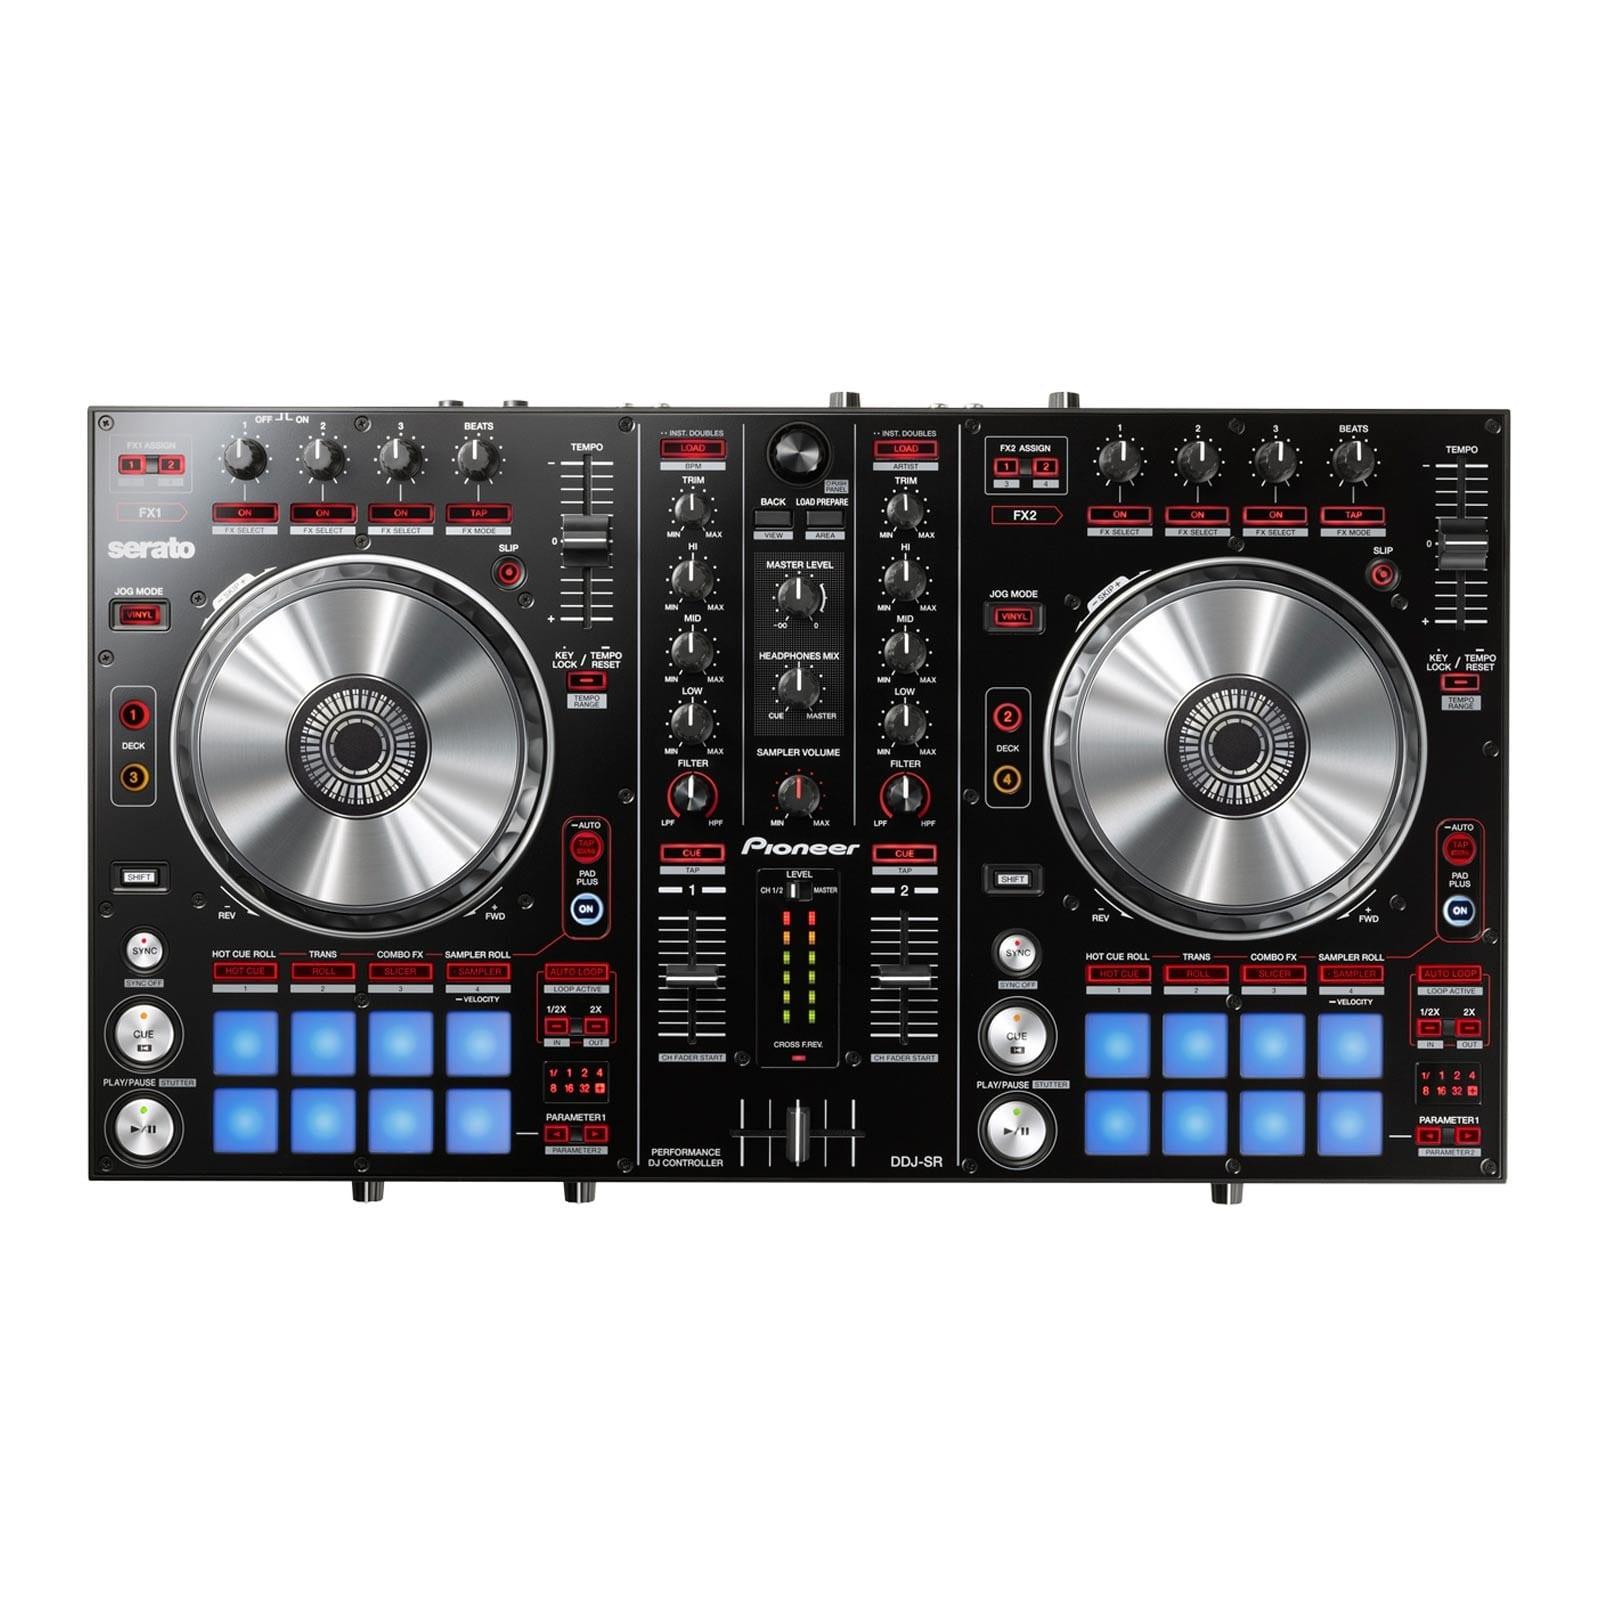 pioneer-ddj-sr-performance-dj-controller-499